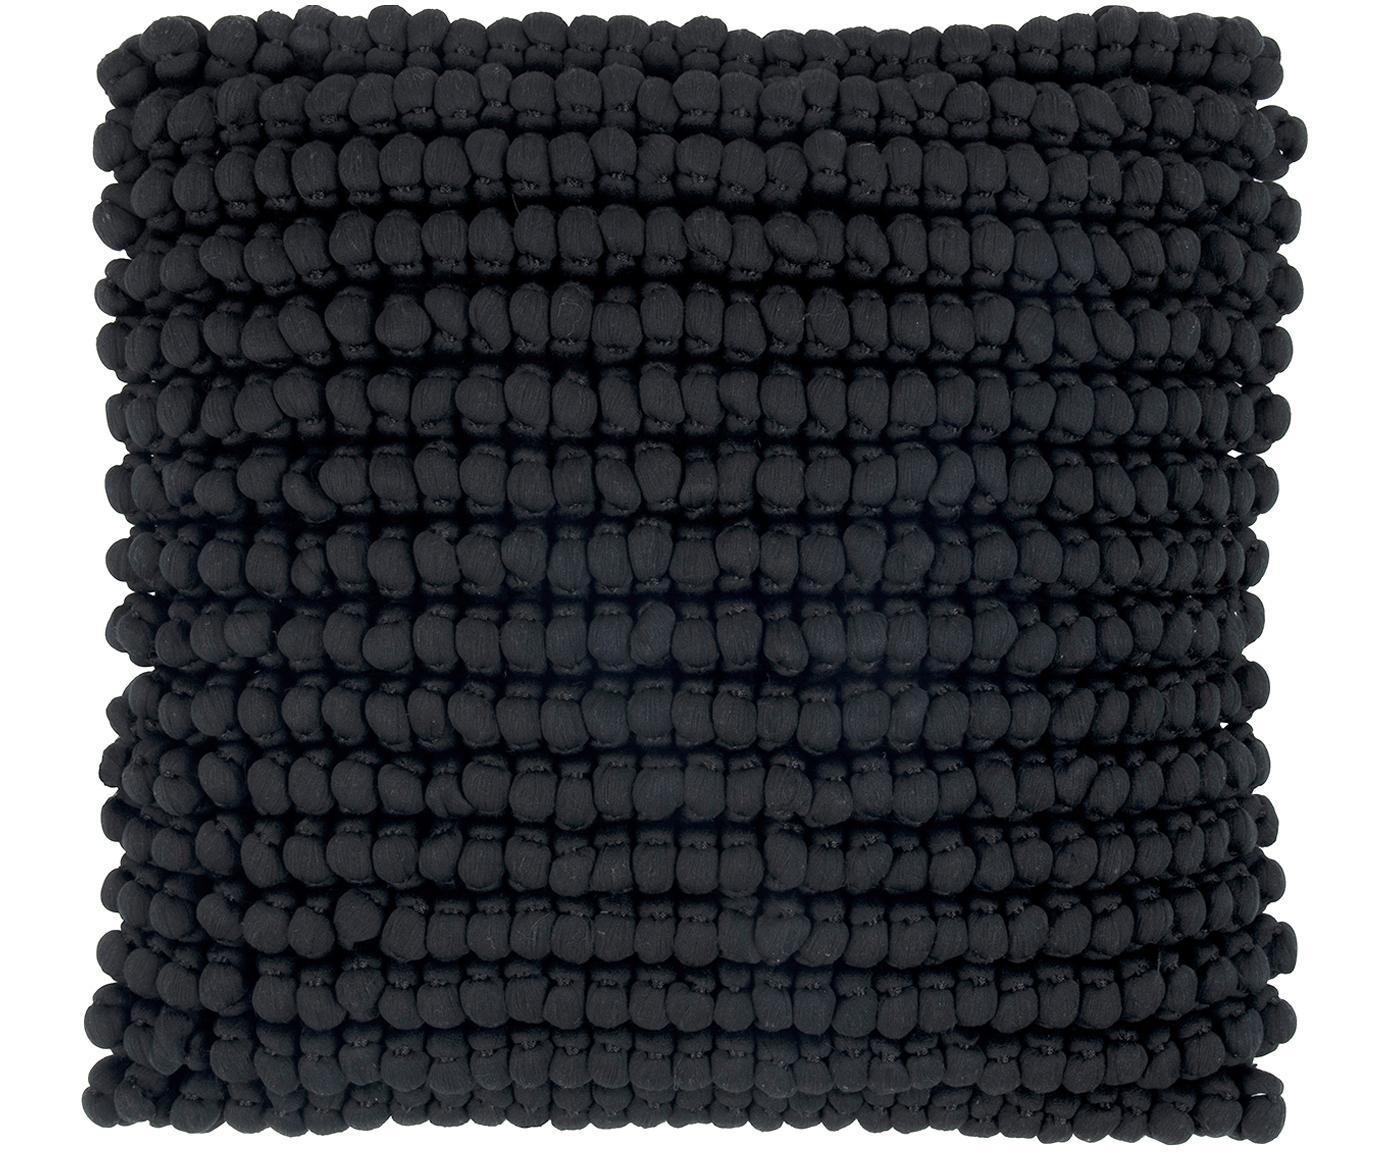 Funda de cojín en tejido de bolitas Iona, Parte delantera: 70%poliéster, 30%algodó, Parte trasera: algodón, Negro, An 45 x L 45 cm